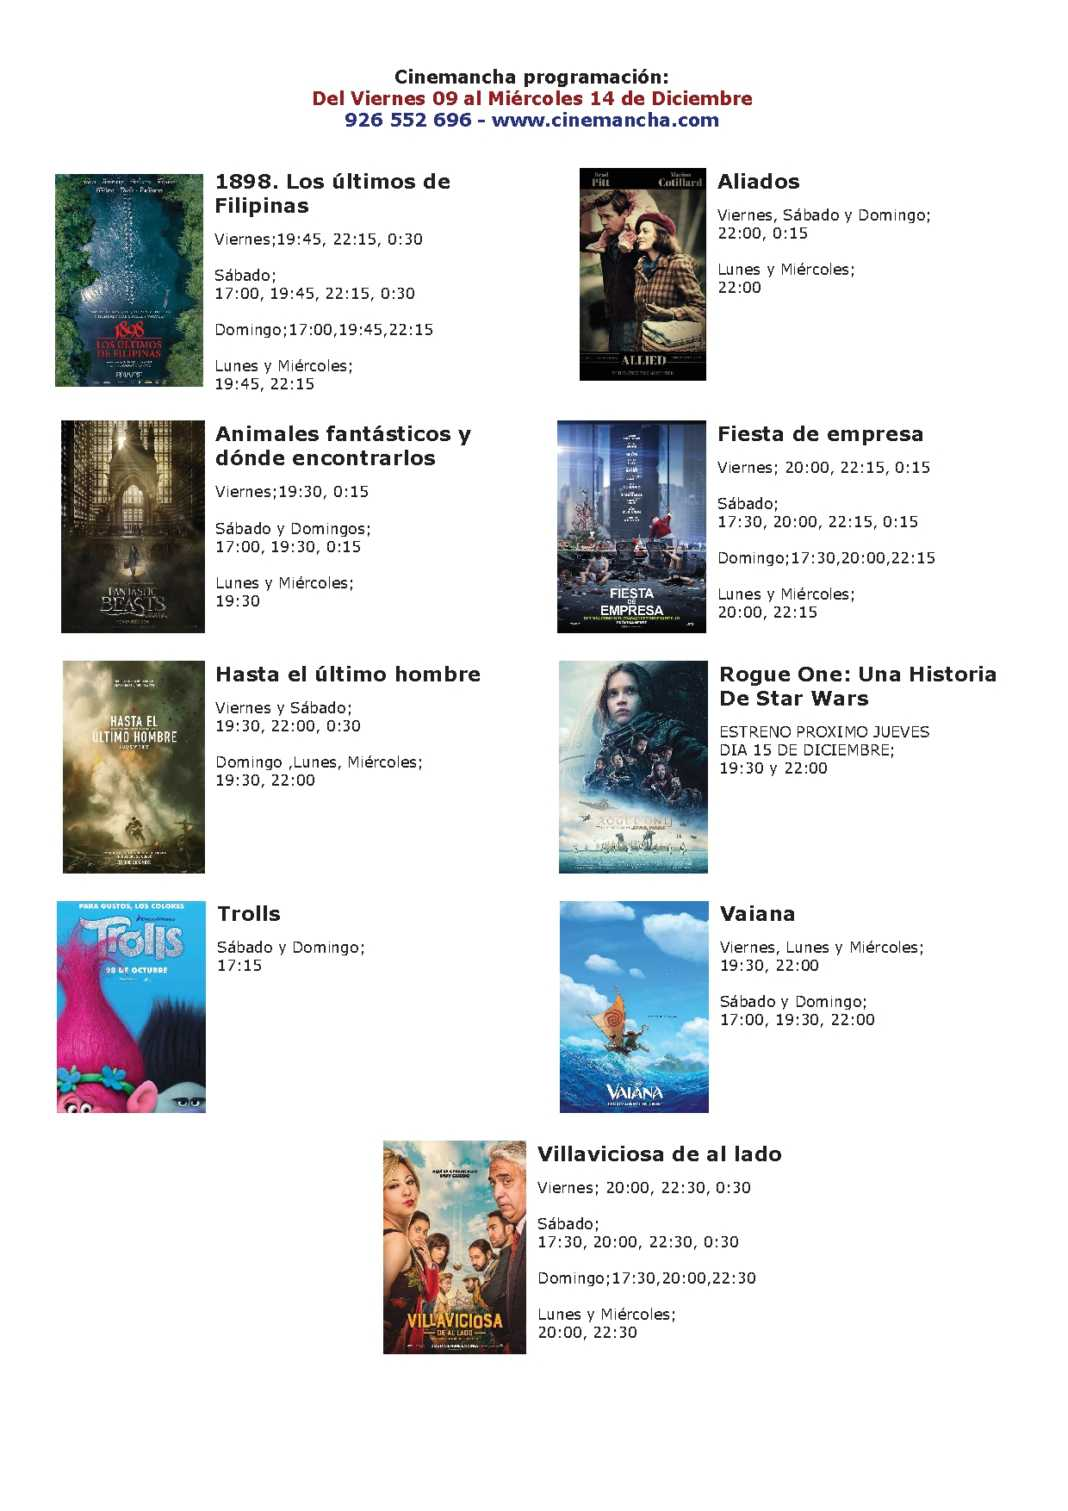 cartelera de cinemancha hasta el MIERCOLES 14 DE DICIEMBRE 1068x1511 - Cartelera Cinemancha hasta el MIÉRCOLES 14 de diciembre